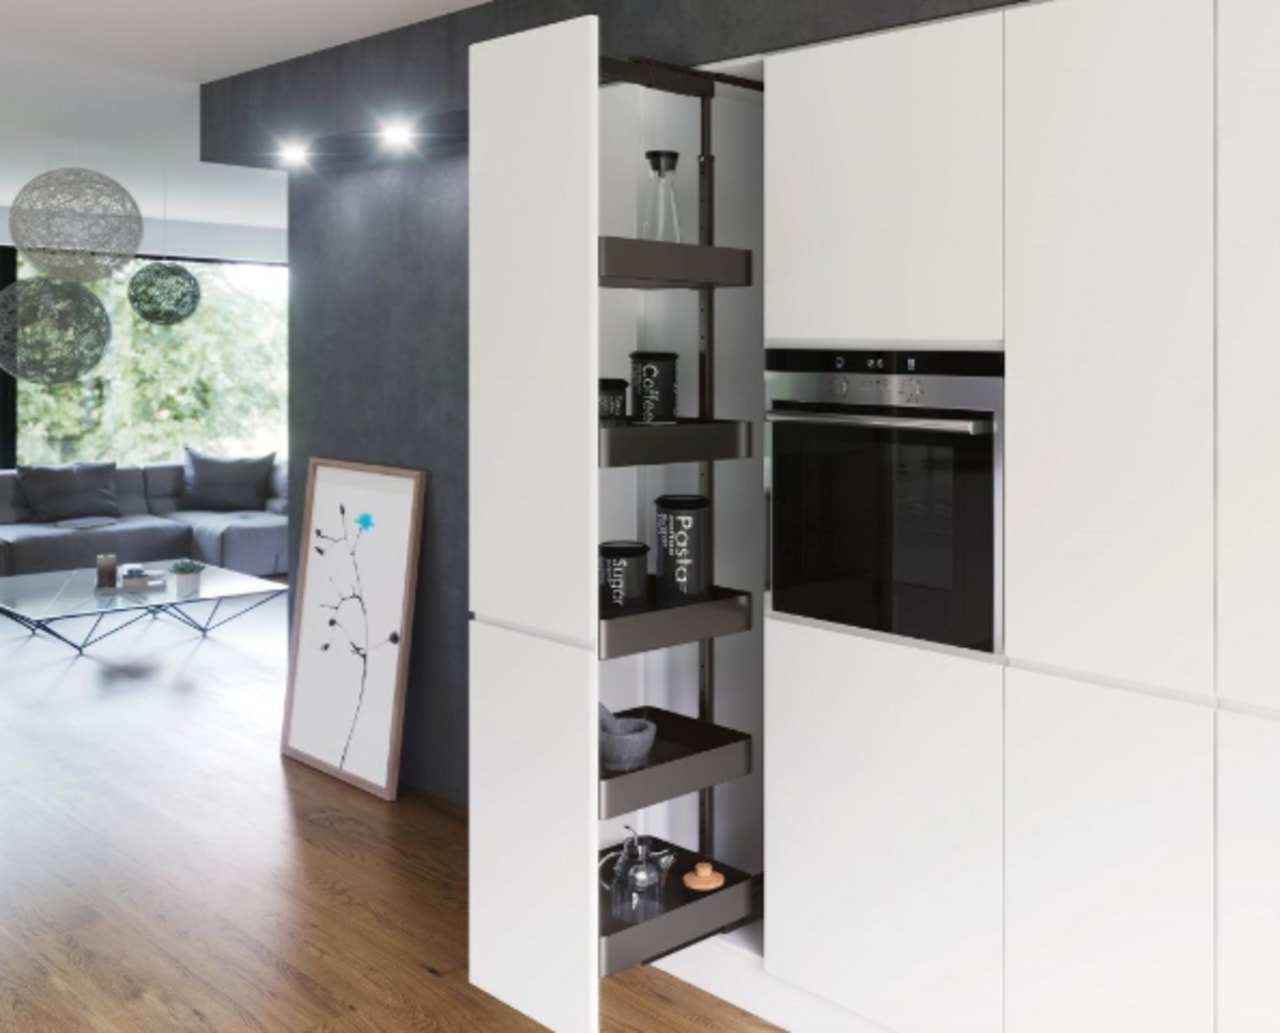 An example of the Planero Vs Tal Larder home appliance, interior design, kitchen, white